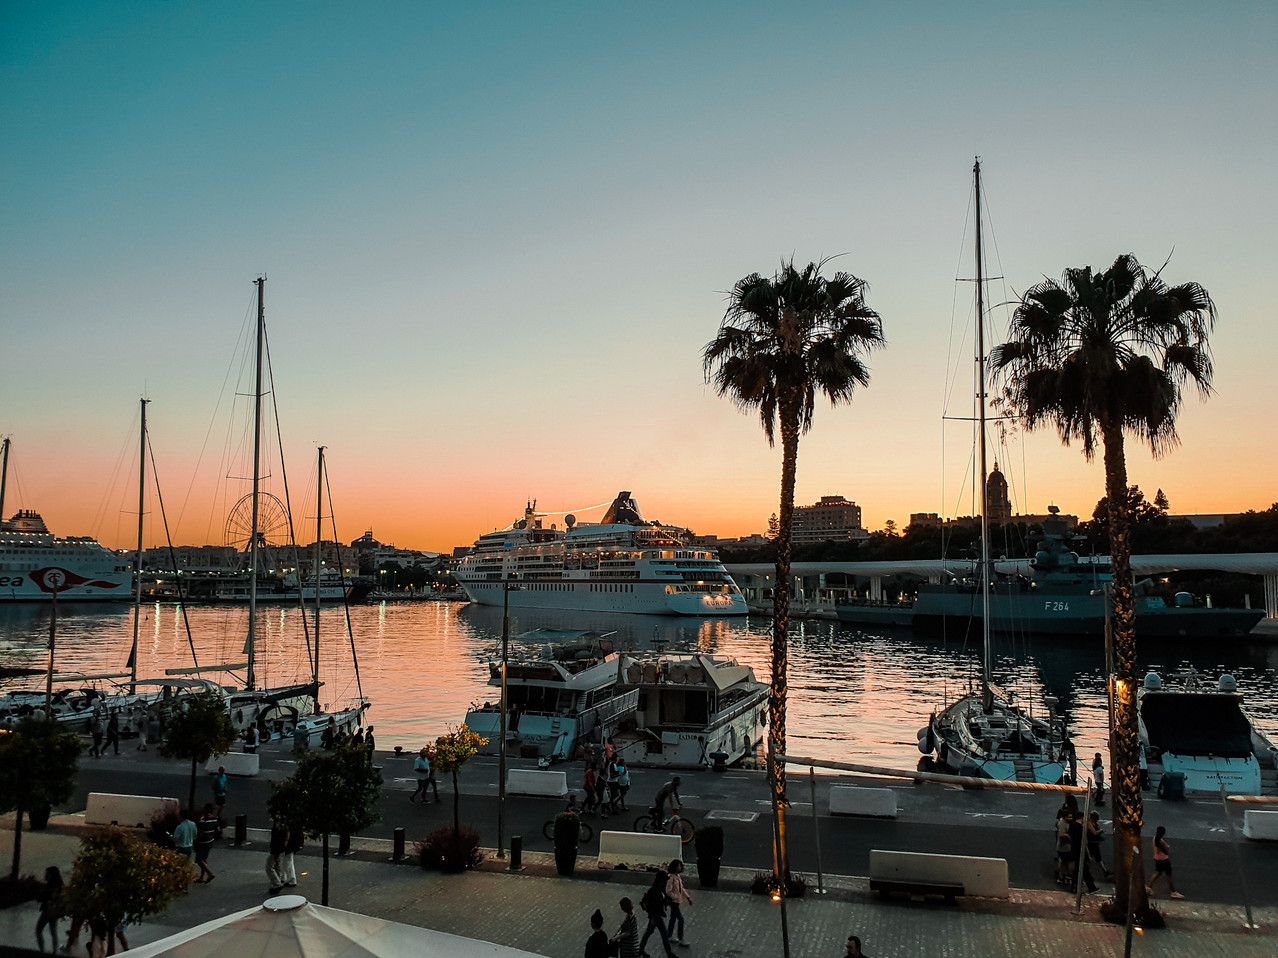 Muelle Uno - Hafenpromenade Sunset Malaga - Playa de la Malagueta Olivia Libi